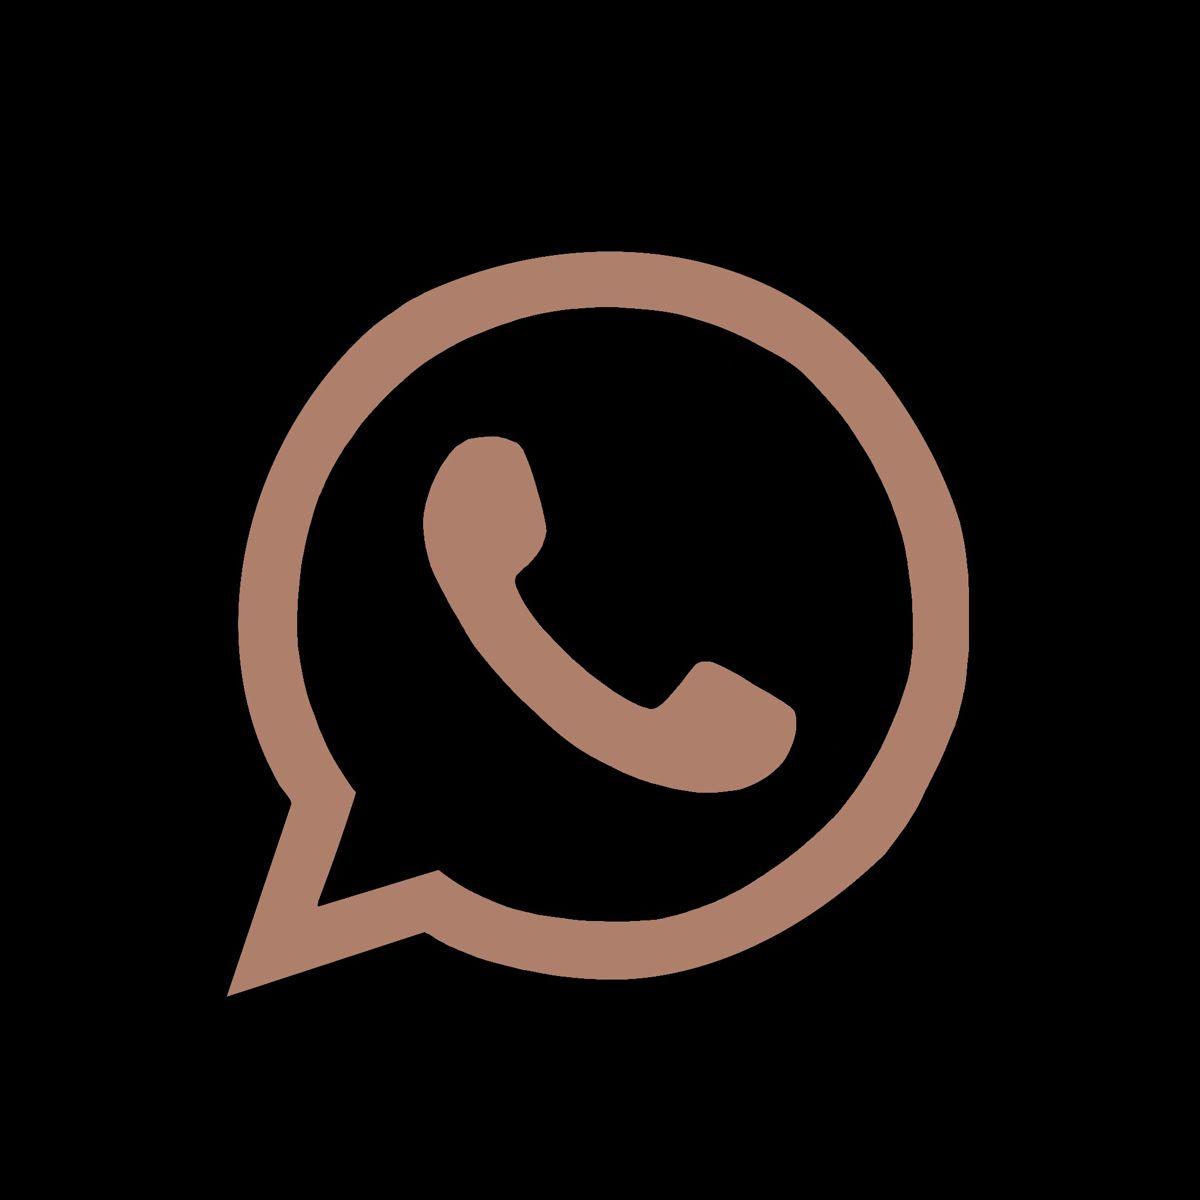 Whatsapp Icon Aesthetic Beige Bmp Tomfoolery